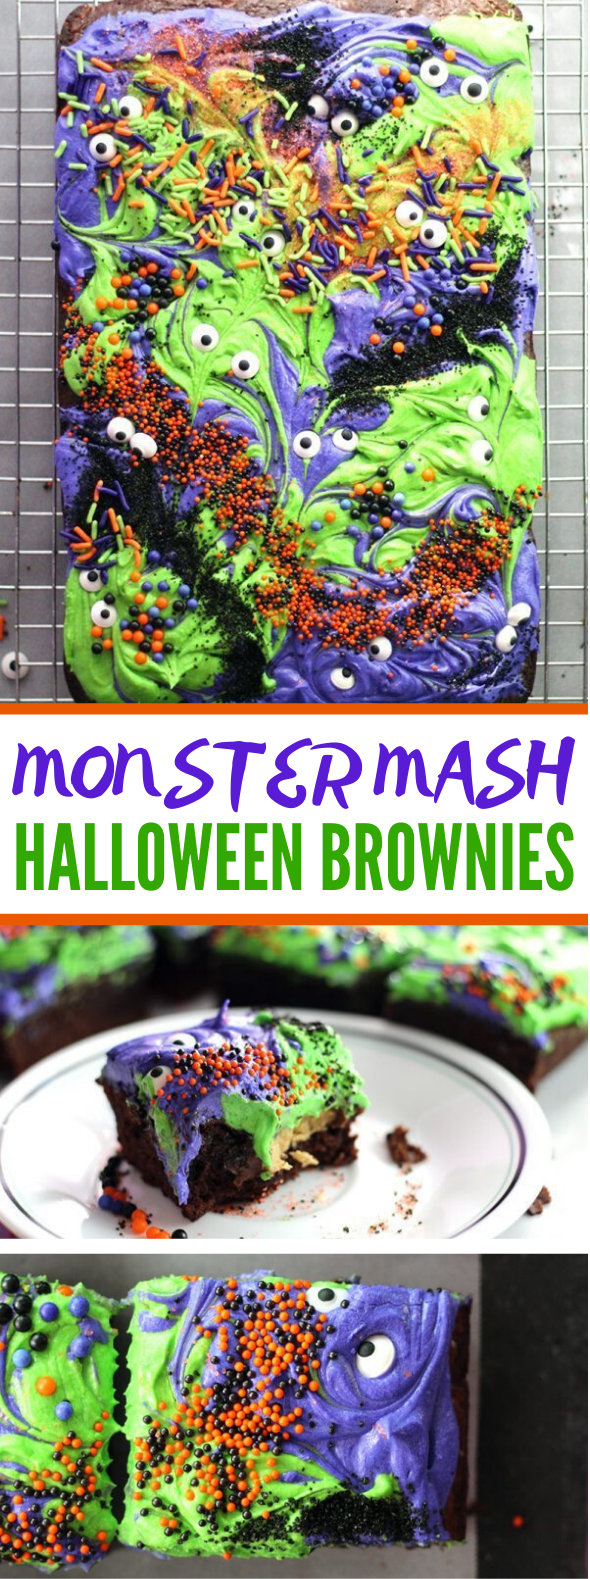 Scary-Cute Monster Mash Halloween Brownies #desserts #cake